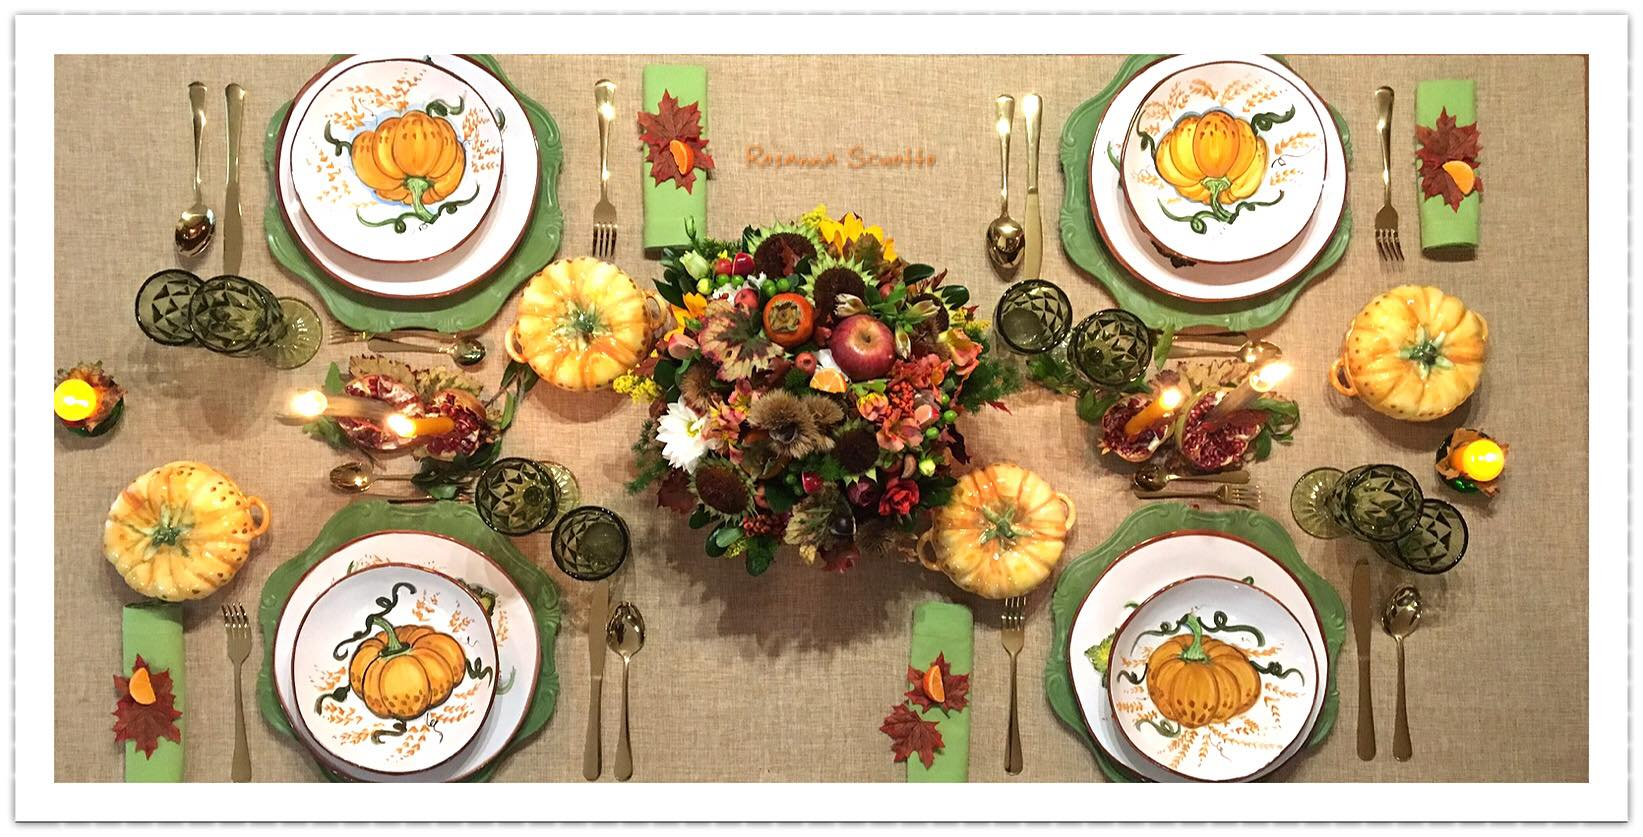 Speciale: una tavola di Halloween rustic-chic